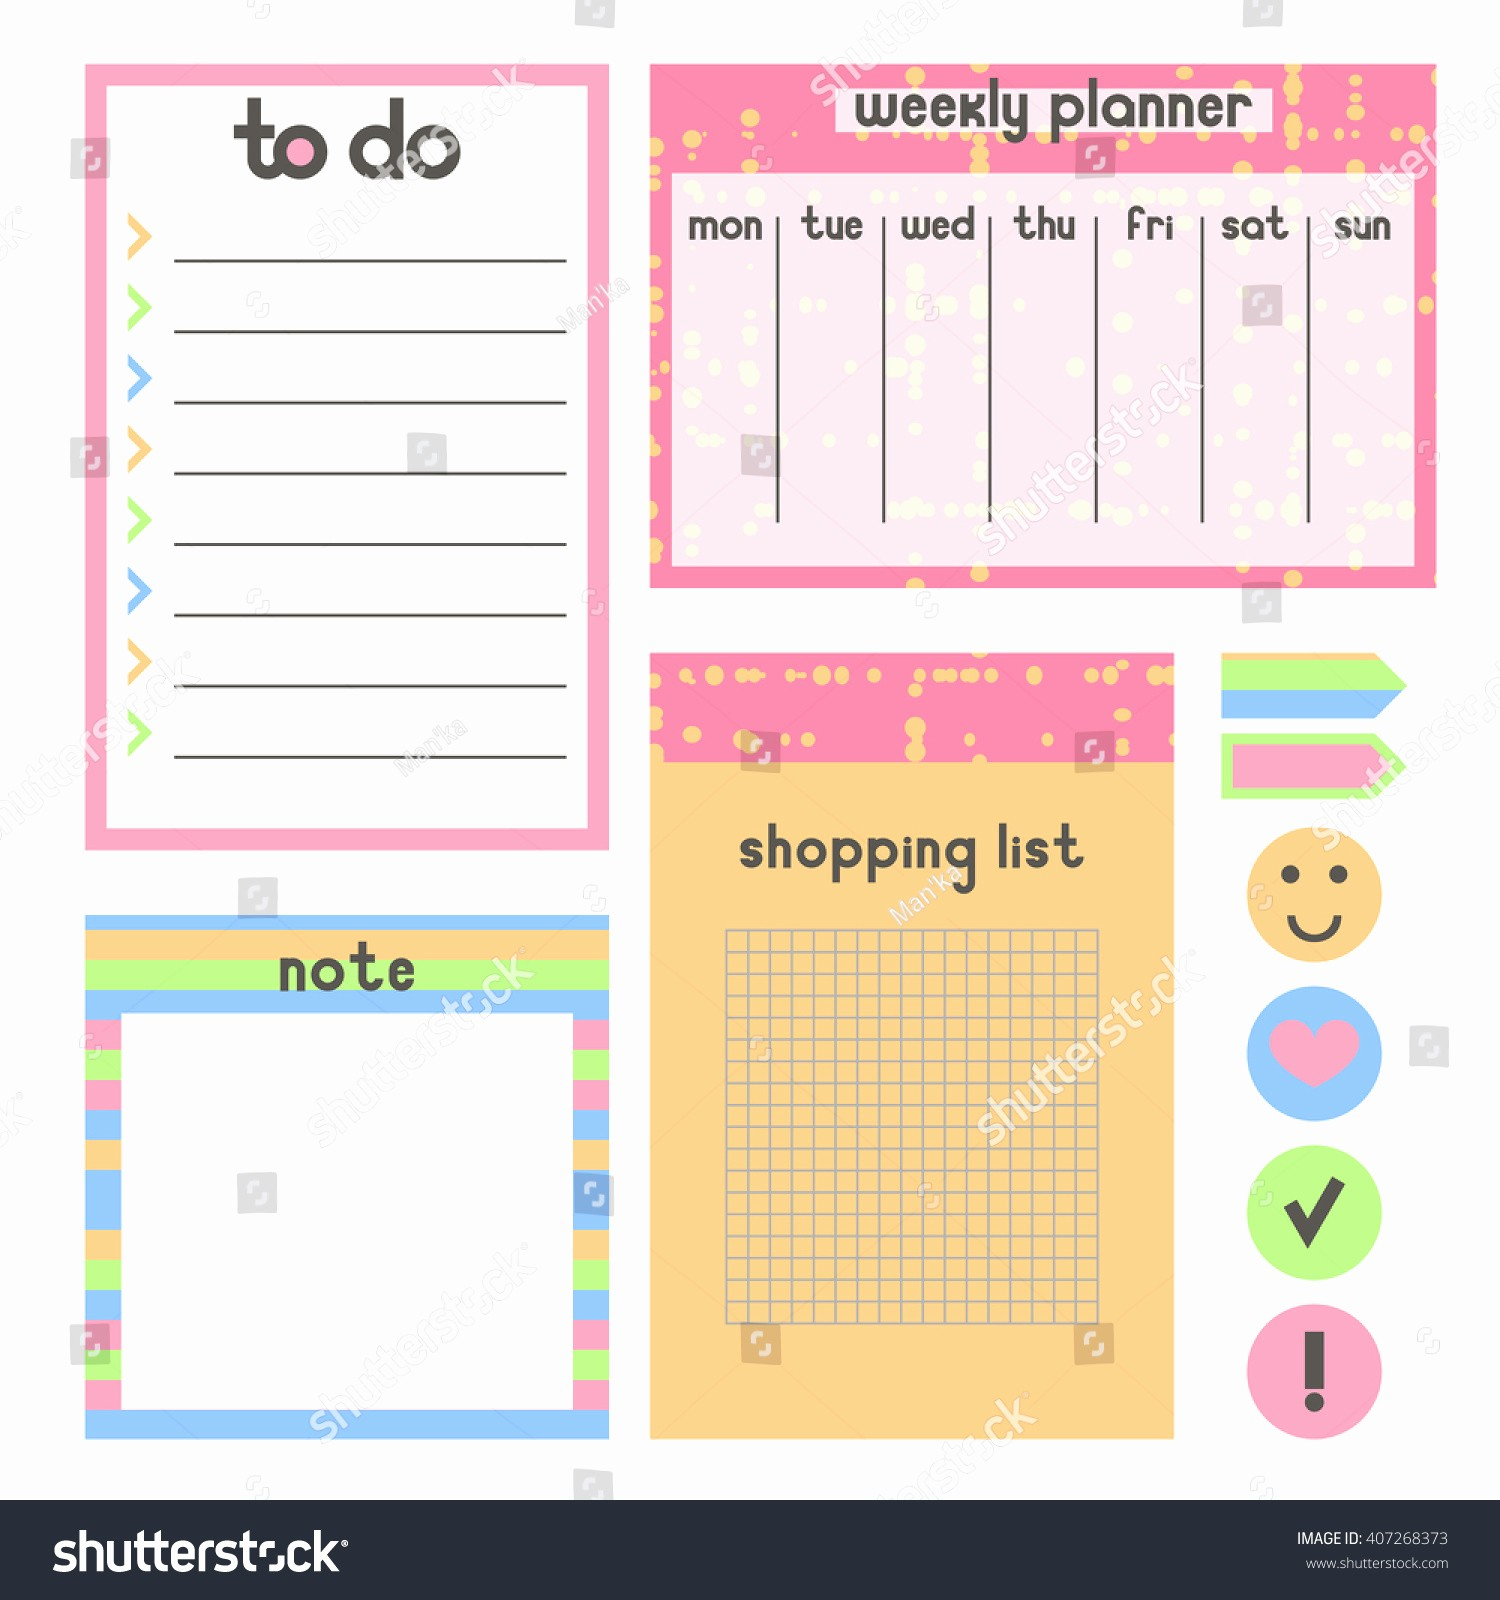 To Do List organizer Template Unique Template organaizer Notebook Planner Do List Stock Vector